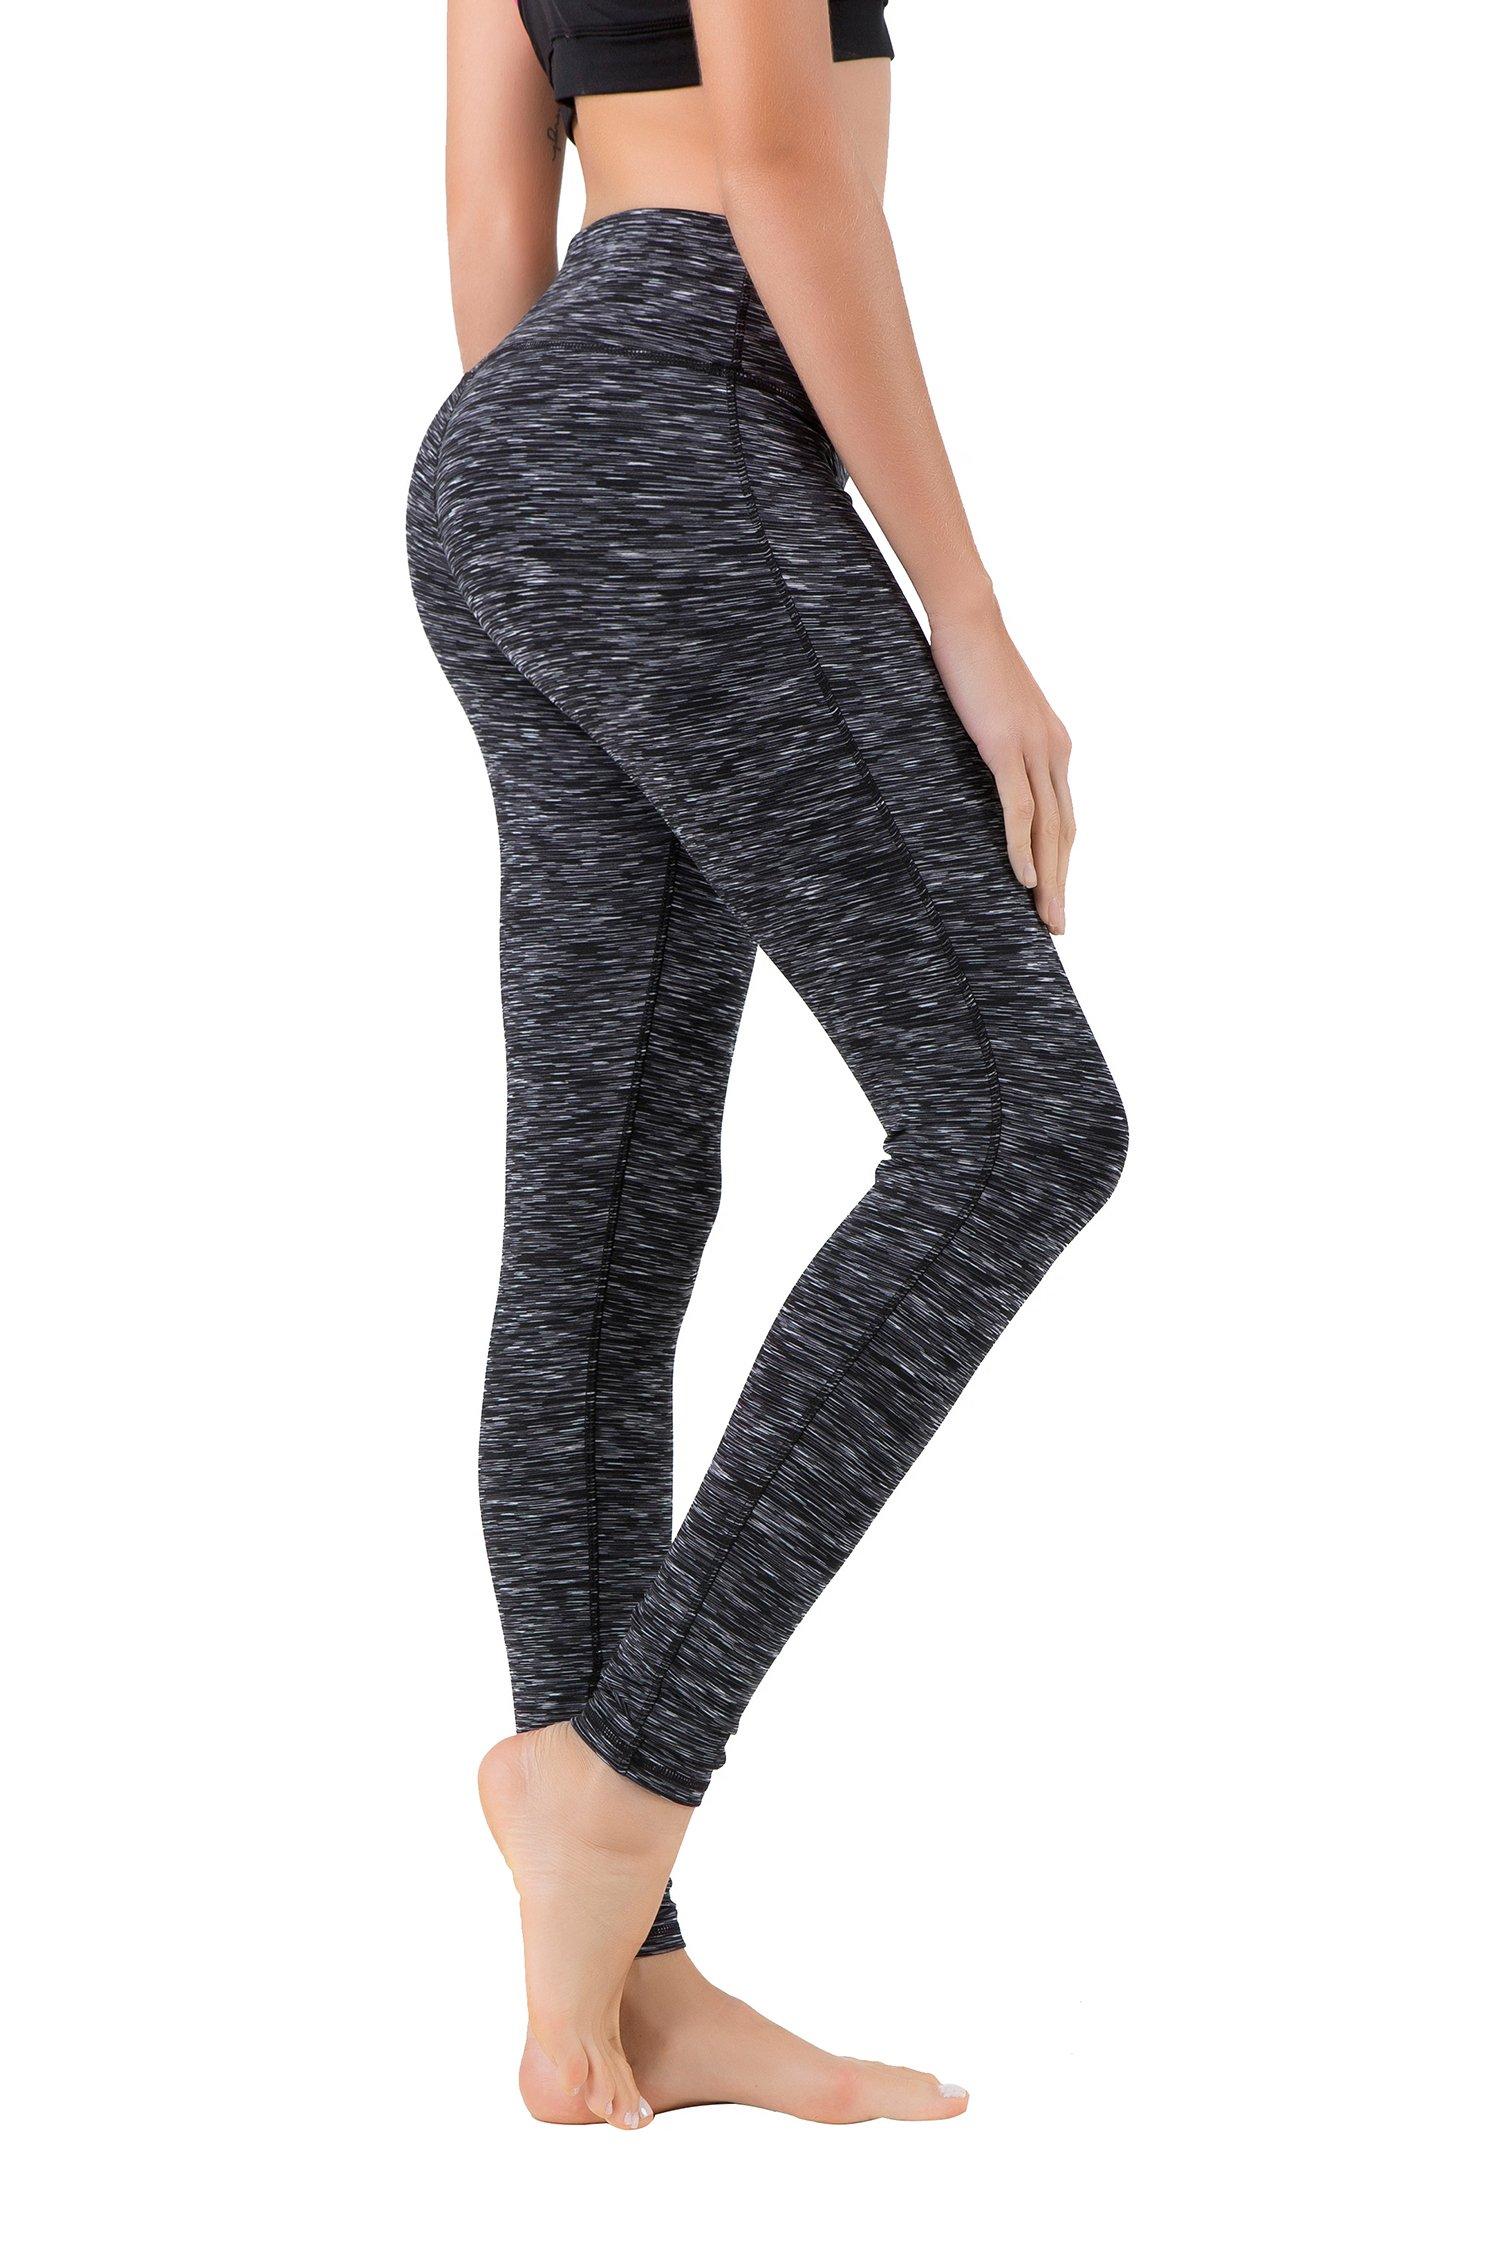 Queenie Ke Women Power Flex Yoga Pants Workout Running Leggings Size XS Color Black Grey Space Dye Long